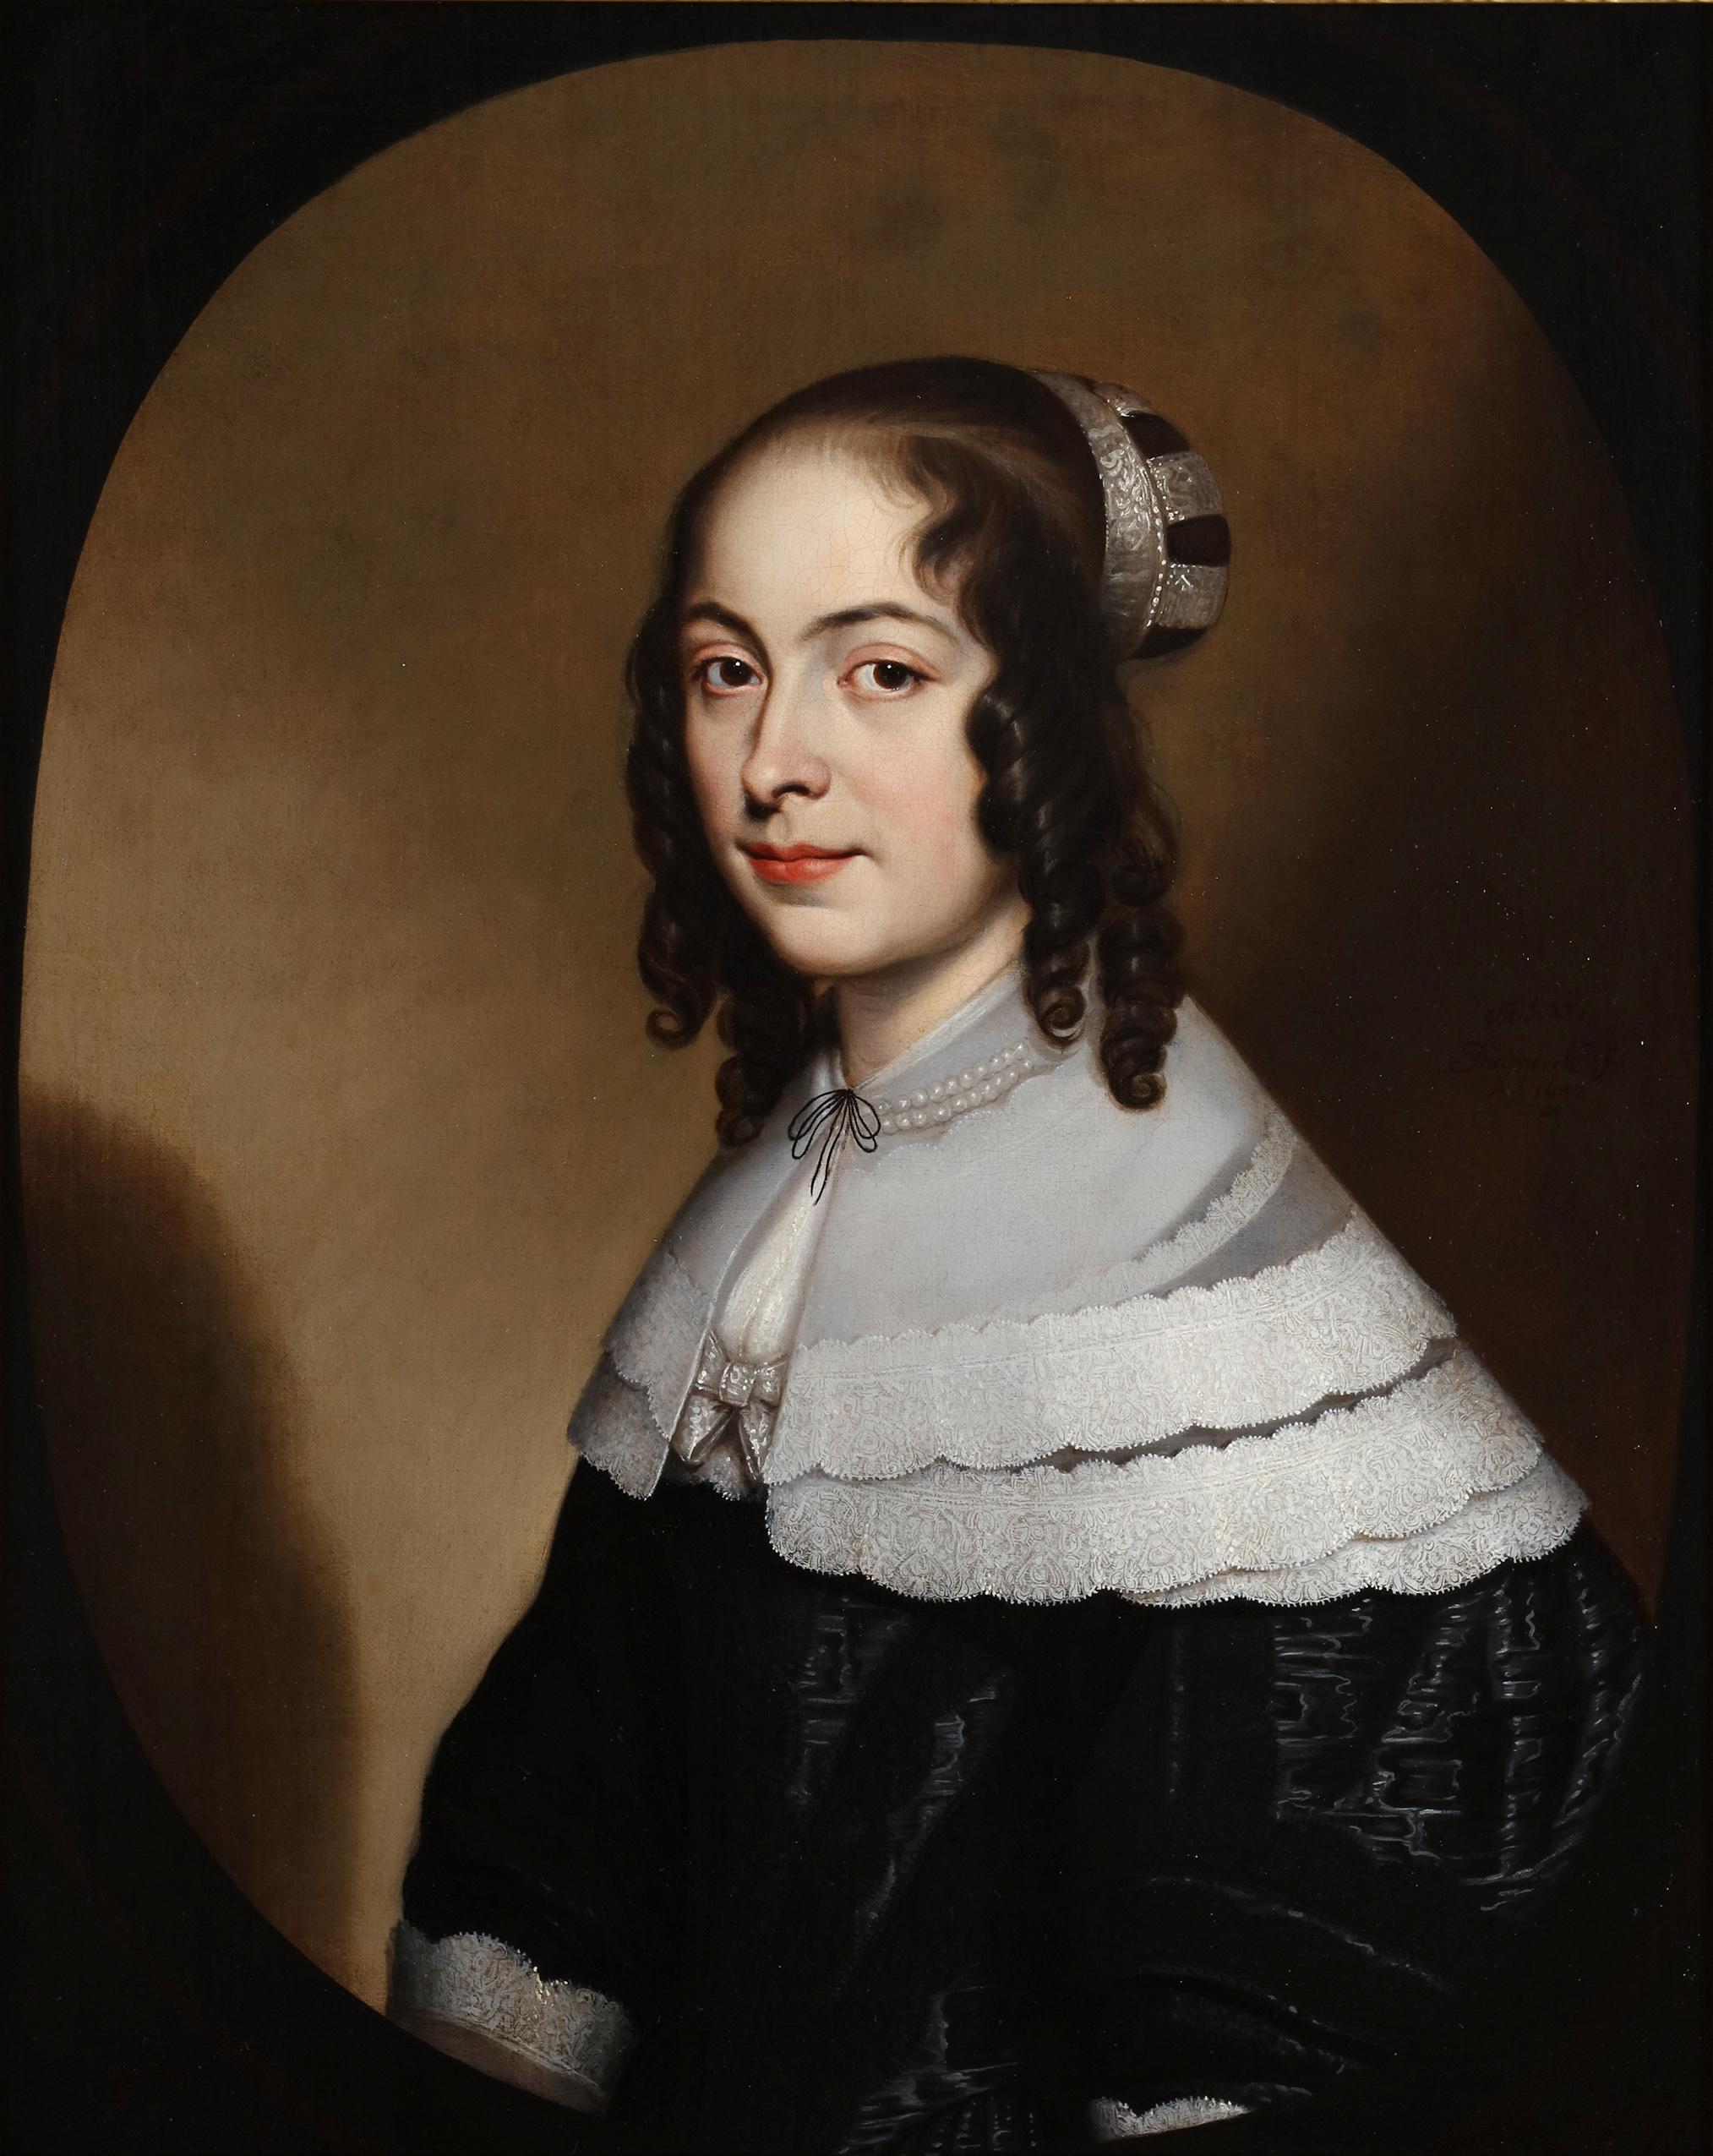 A portrait of Elizabetha Margaretha de Spina (1626-1702)